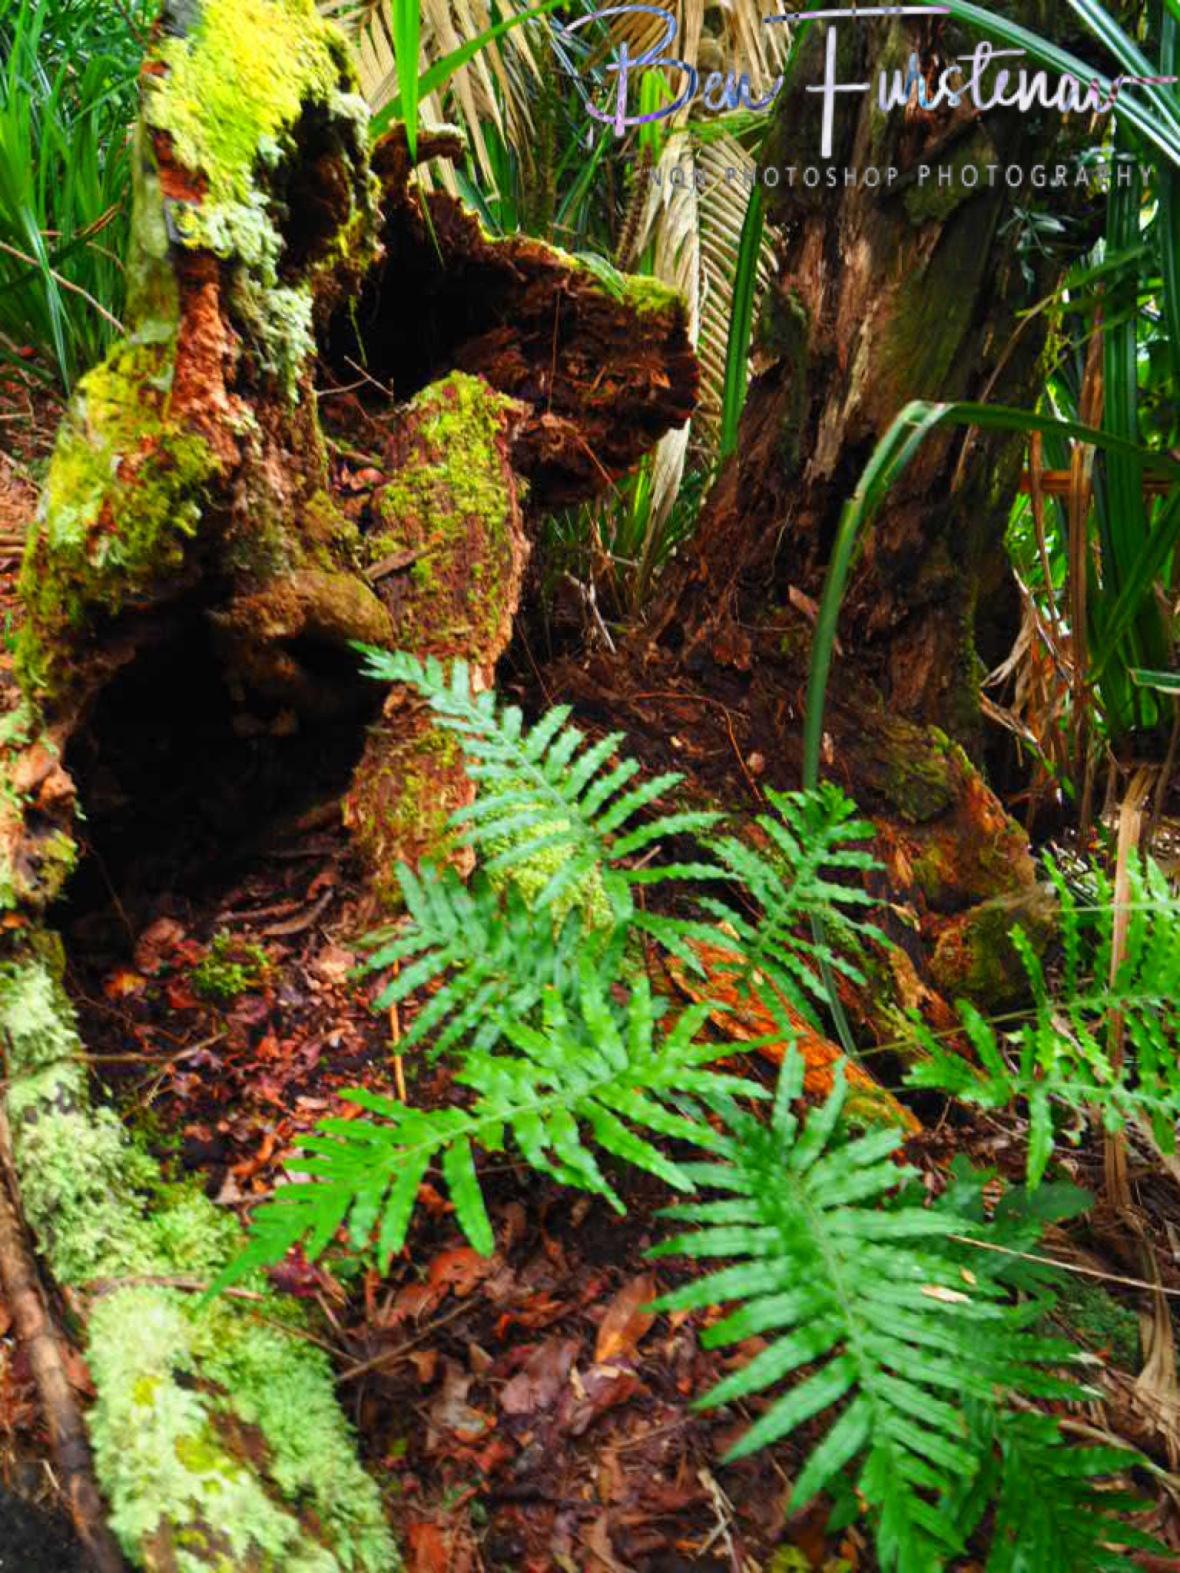 Forest housing at Babinda, Tropical Northern Queensland, Australia